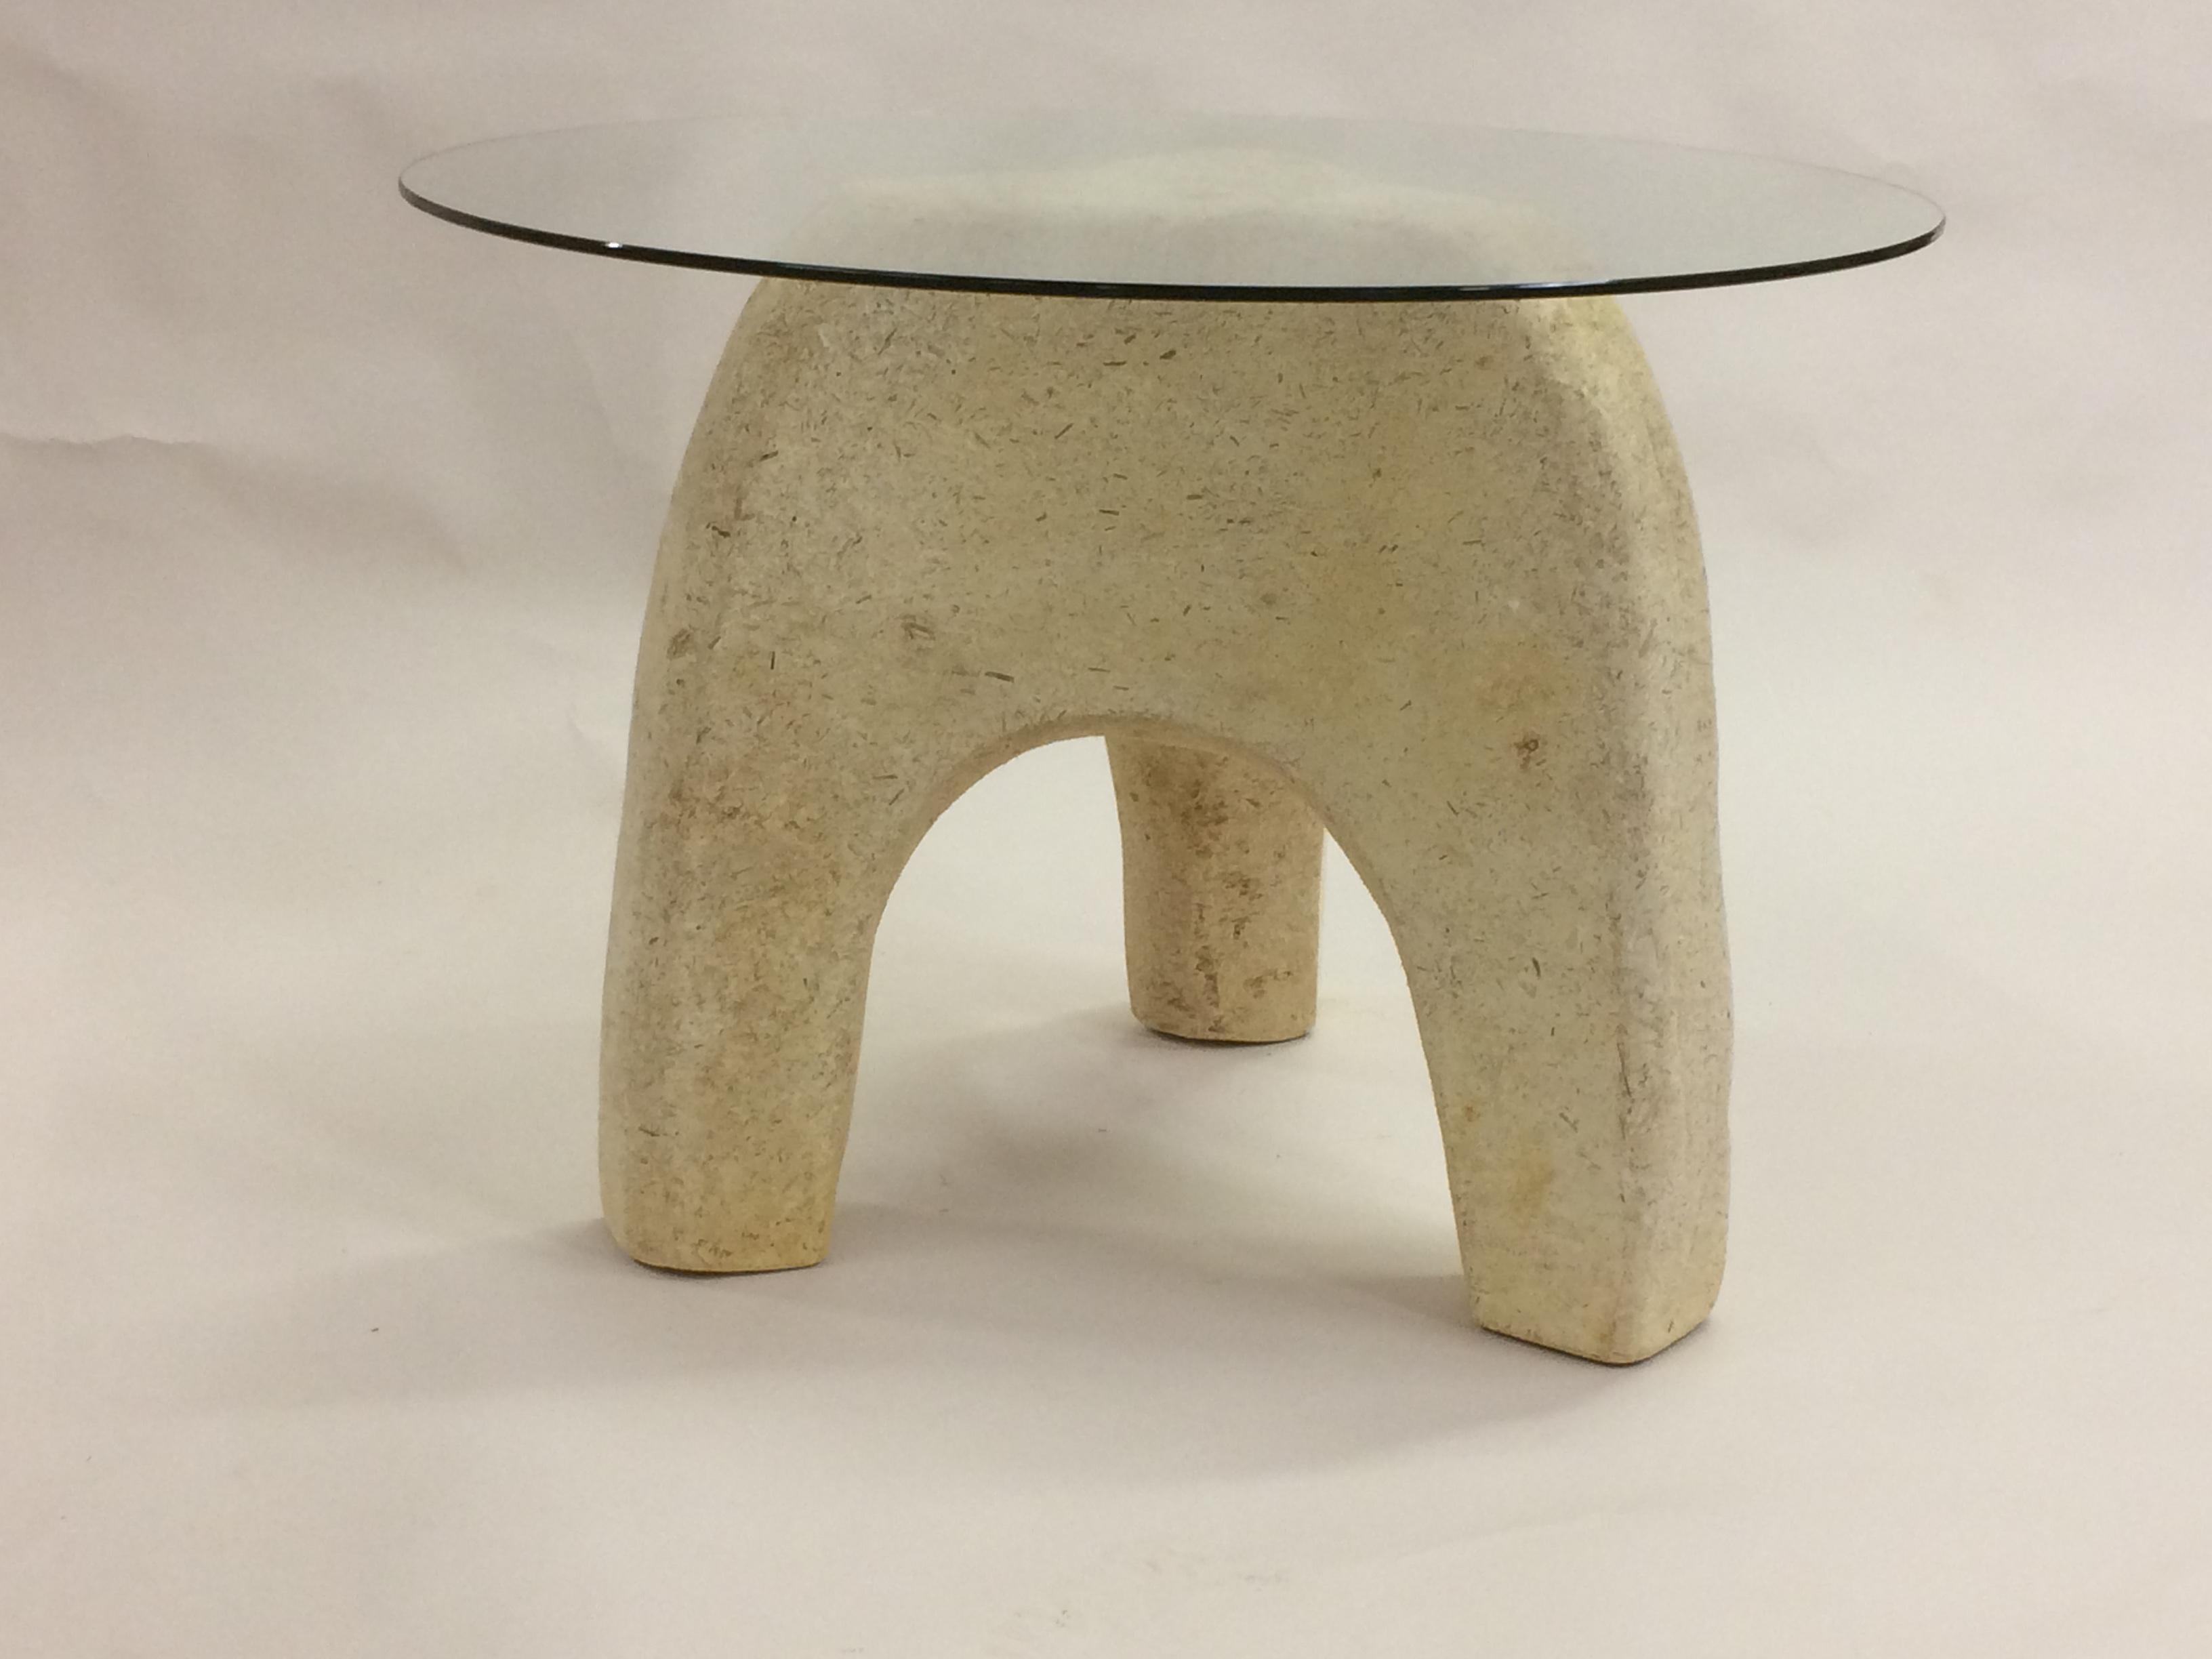 Prime Giy Mushroom Furniture With Tom Sippel Grow Bio Download Free Architecture Designs Crovemadebymaigaardcom